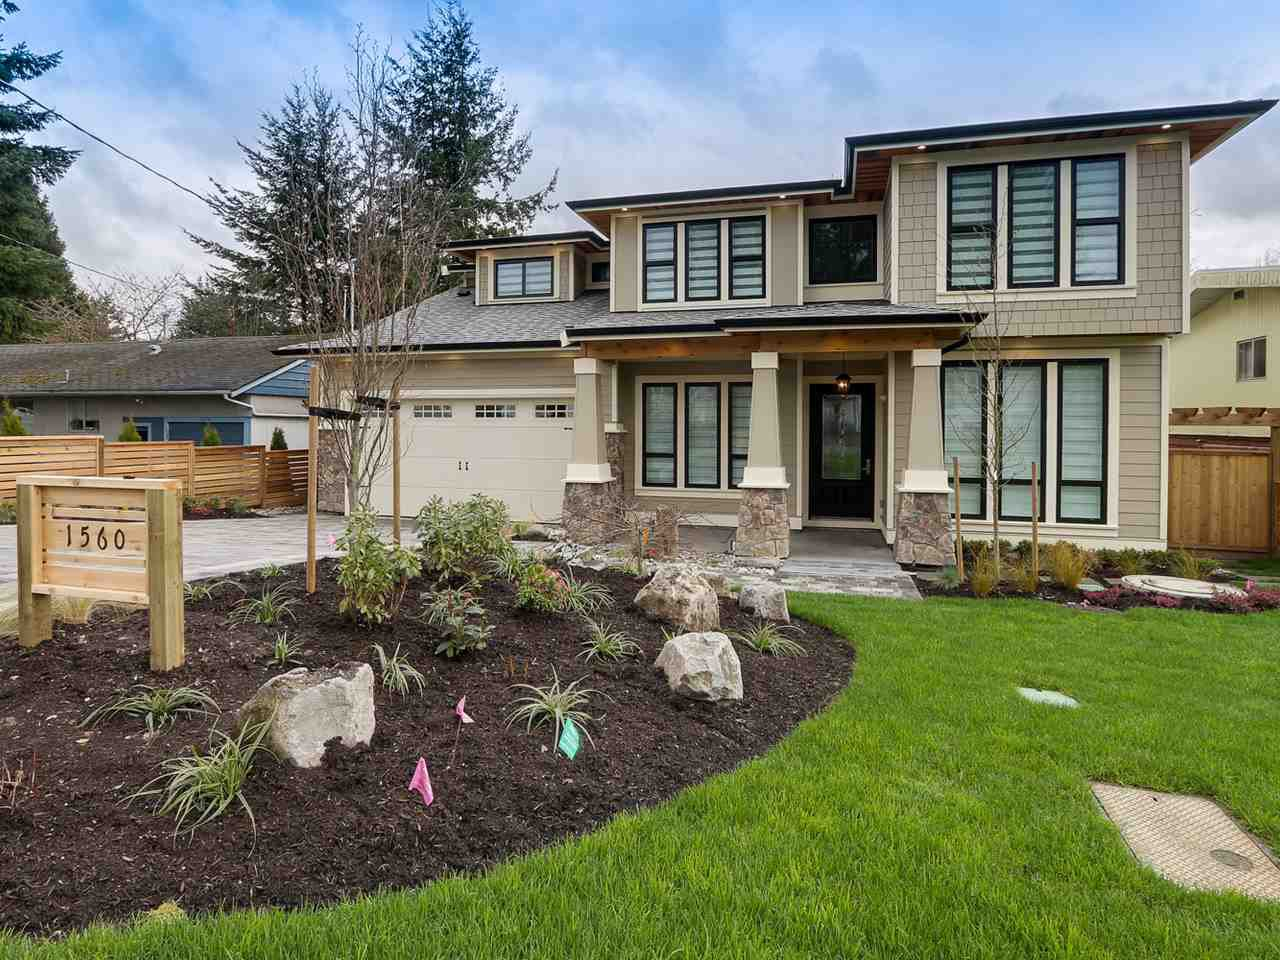 Photo 1: Photos: 1560 MAPLE Street: White Rock House for sale (South Surrey White Rock)  : MLS®# R2138926